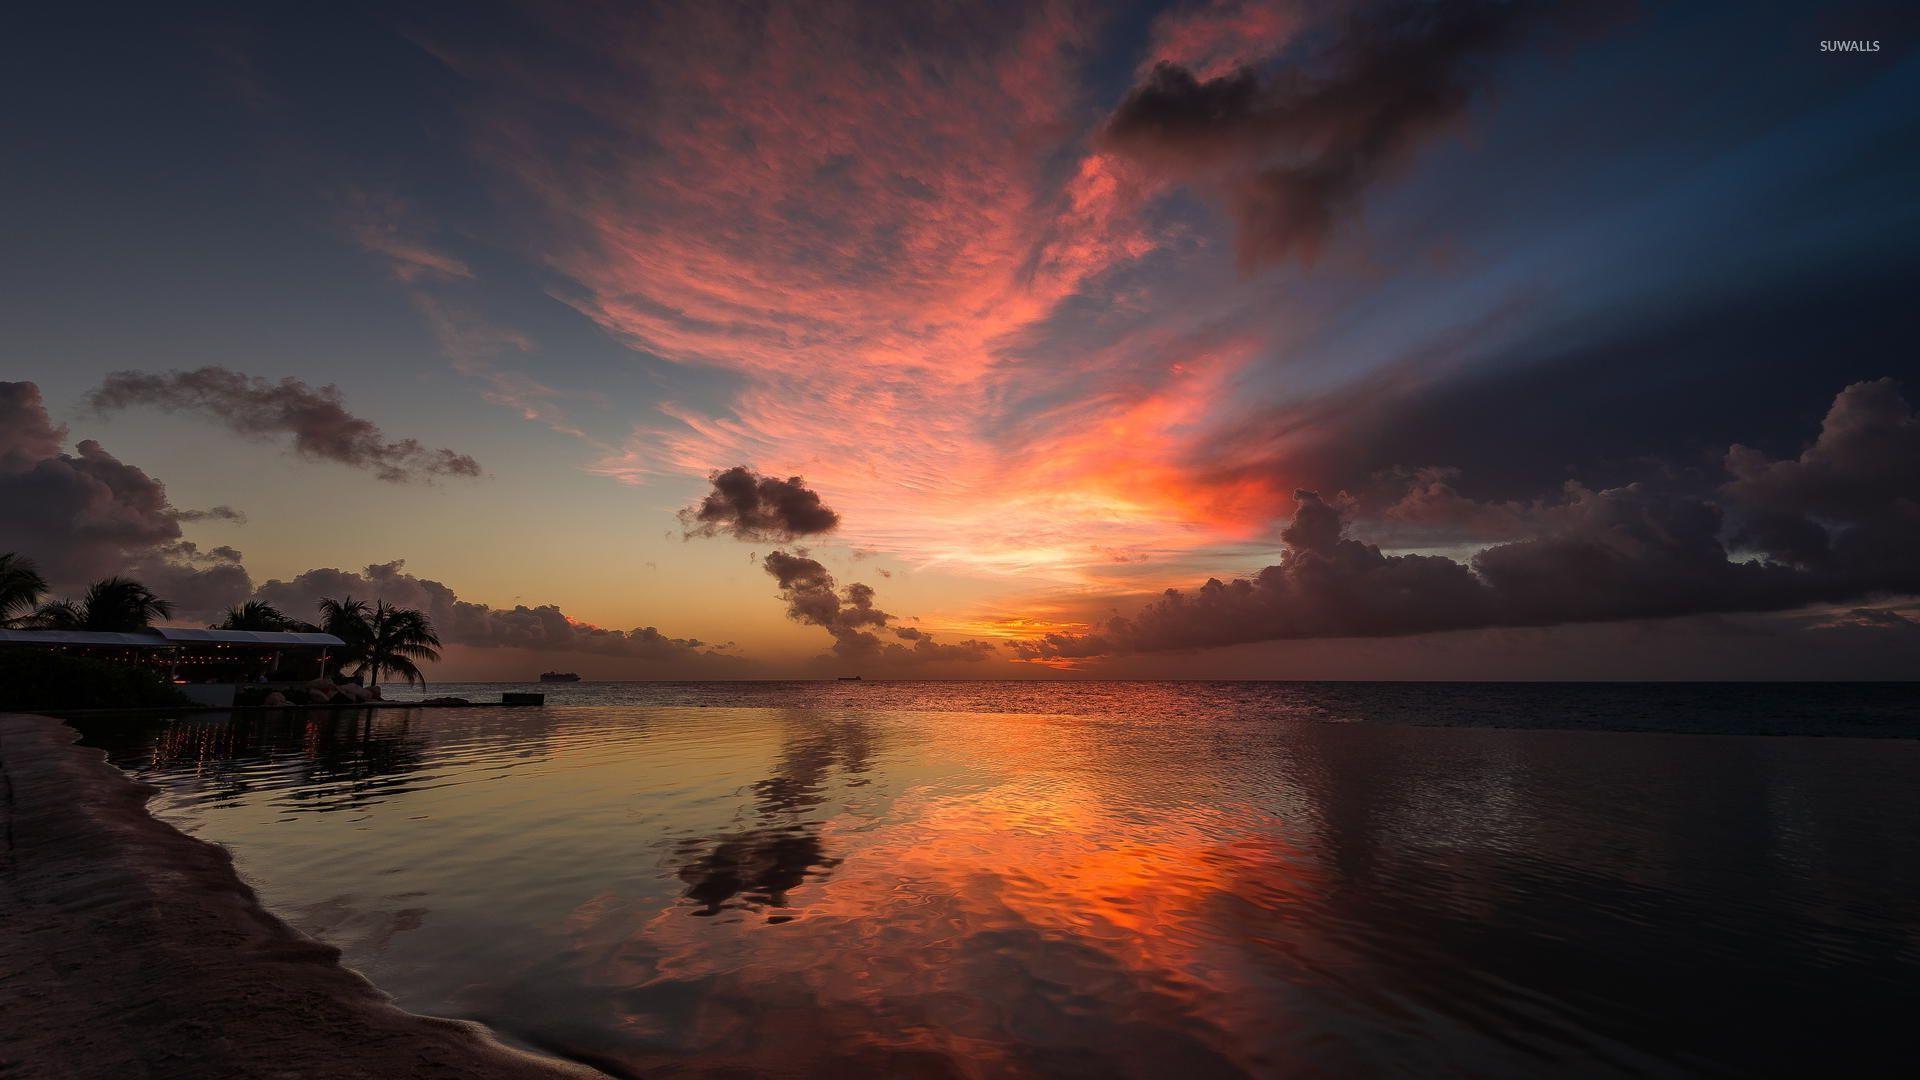 sublime ocean sunset wallpaper - beach wallpapers - #47586